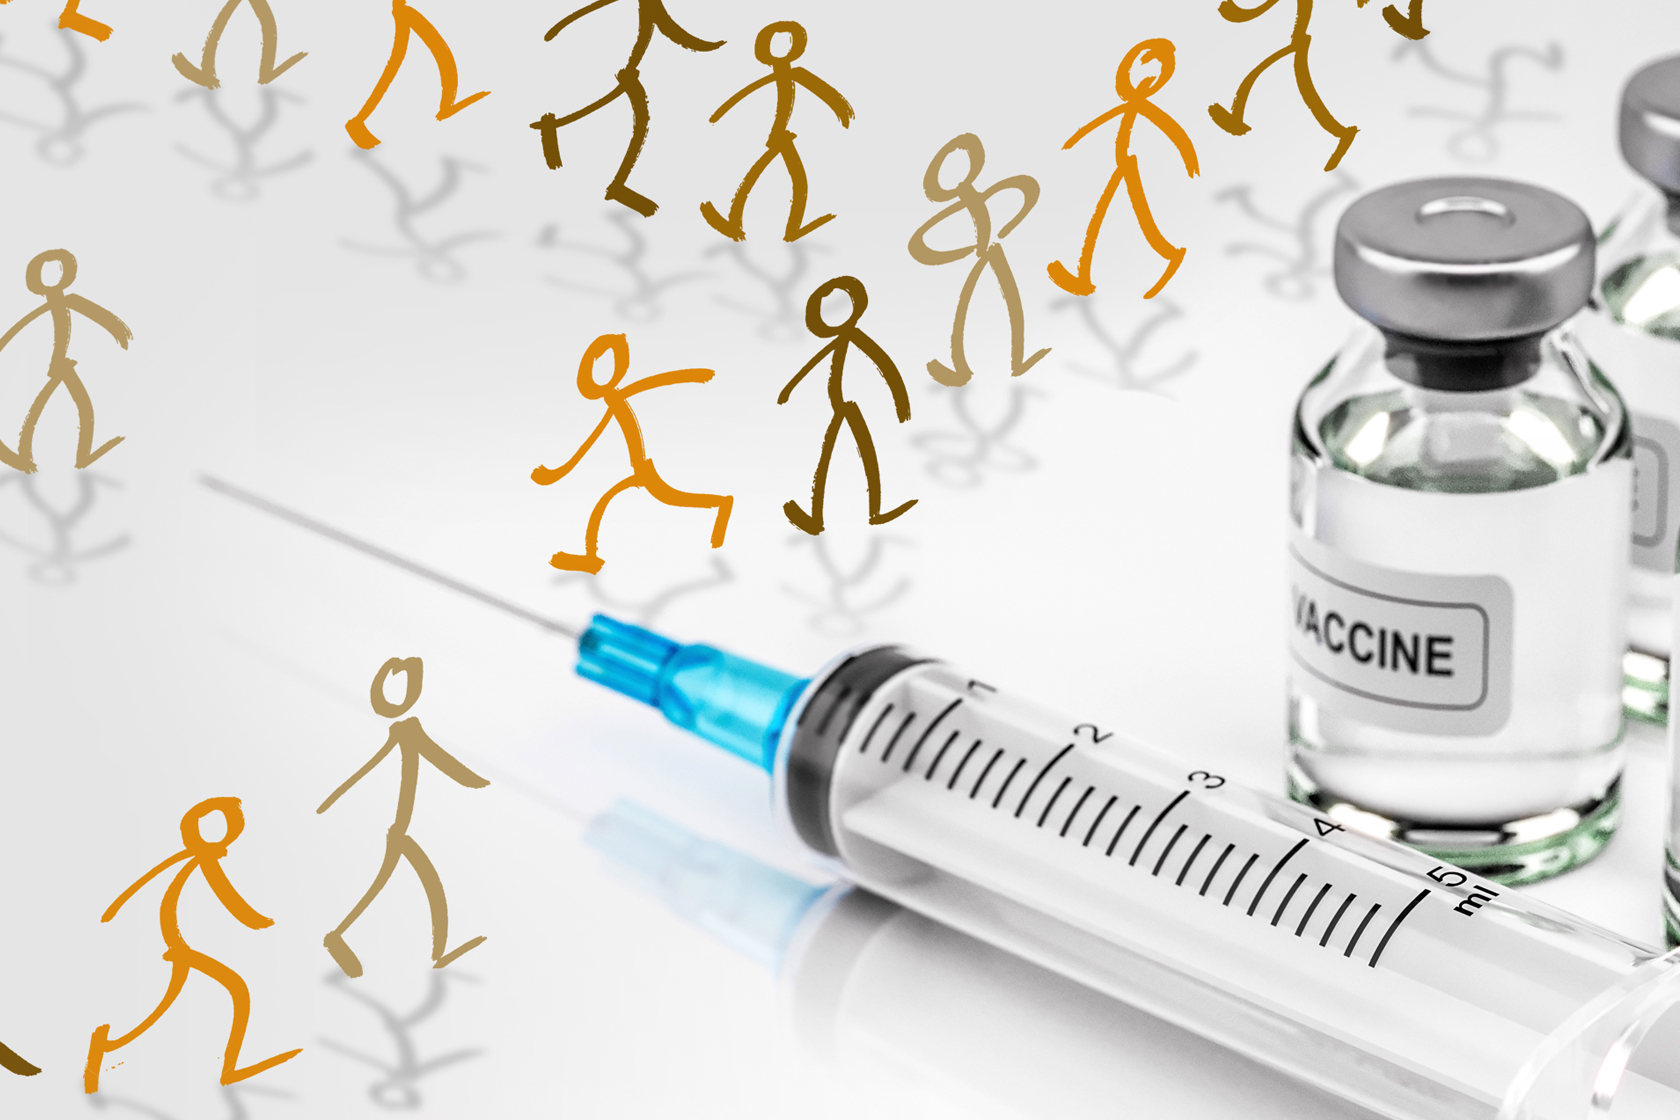 The Vaccination Dilemma